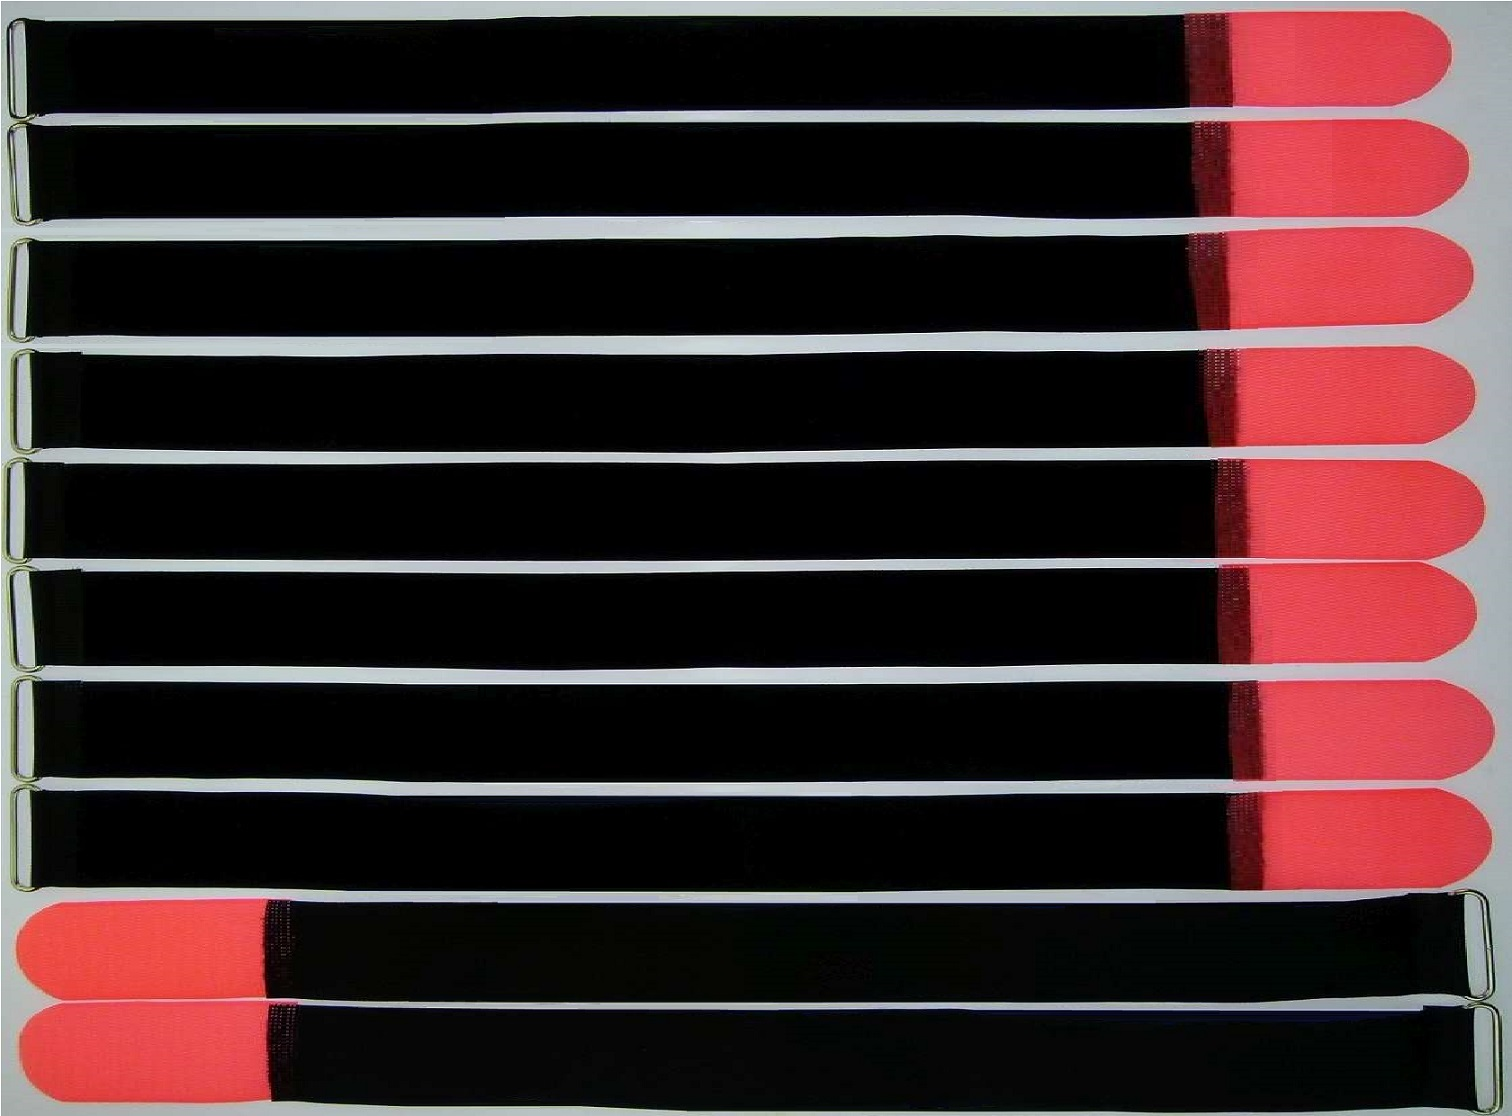 50x Kabelbinder Kabelklett 30 cm x 25 mm neon rot Klettband Klettkabelbinder Öse